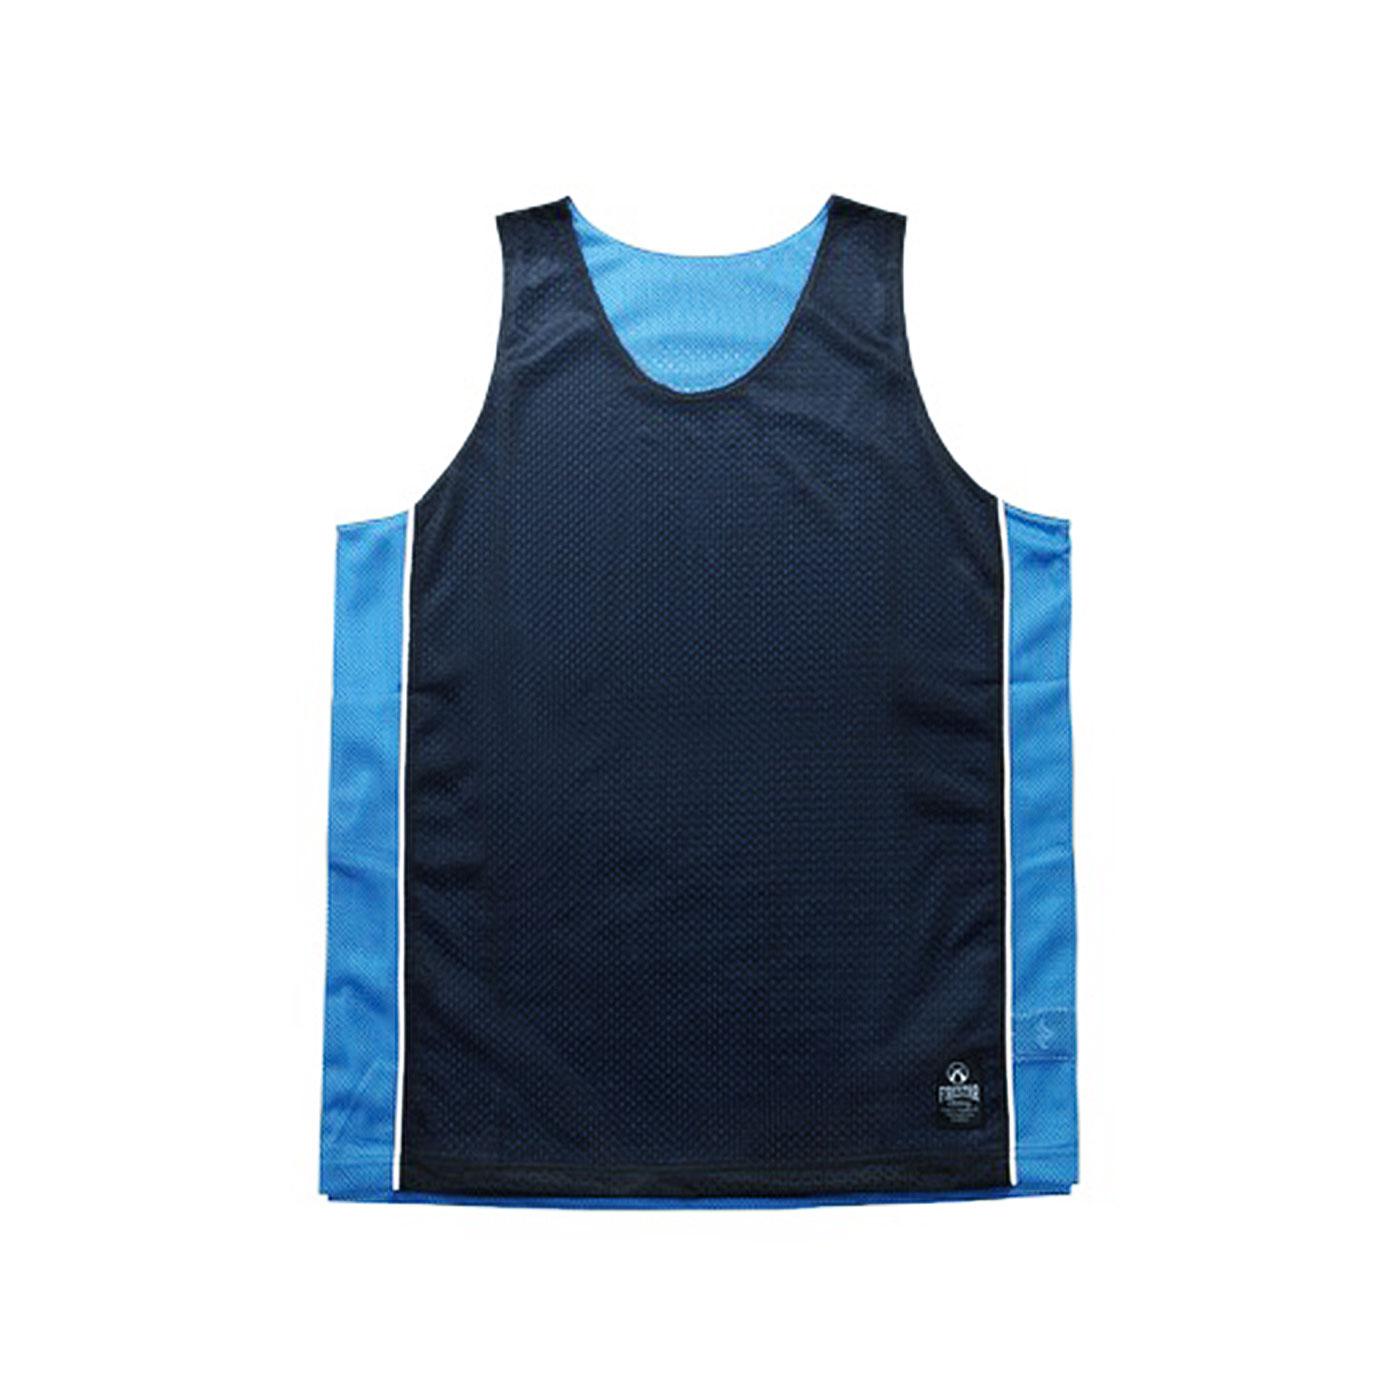 FIRESTAR 籃球背心 B3707-10 - 丈青水藍